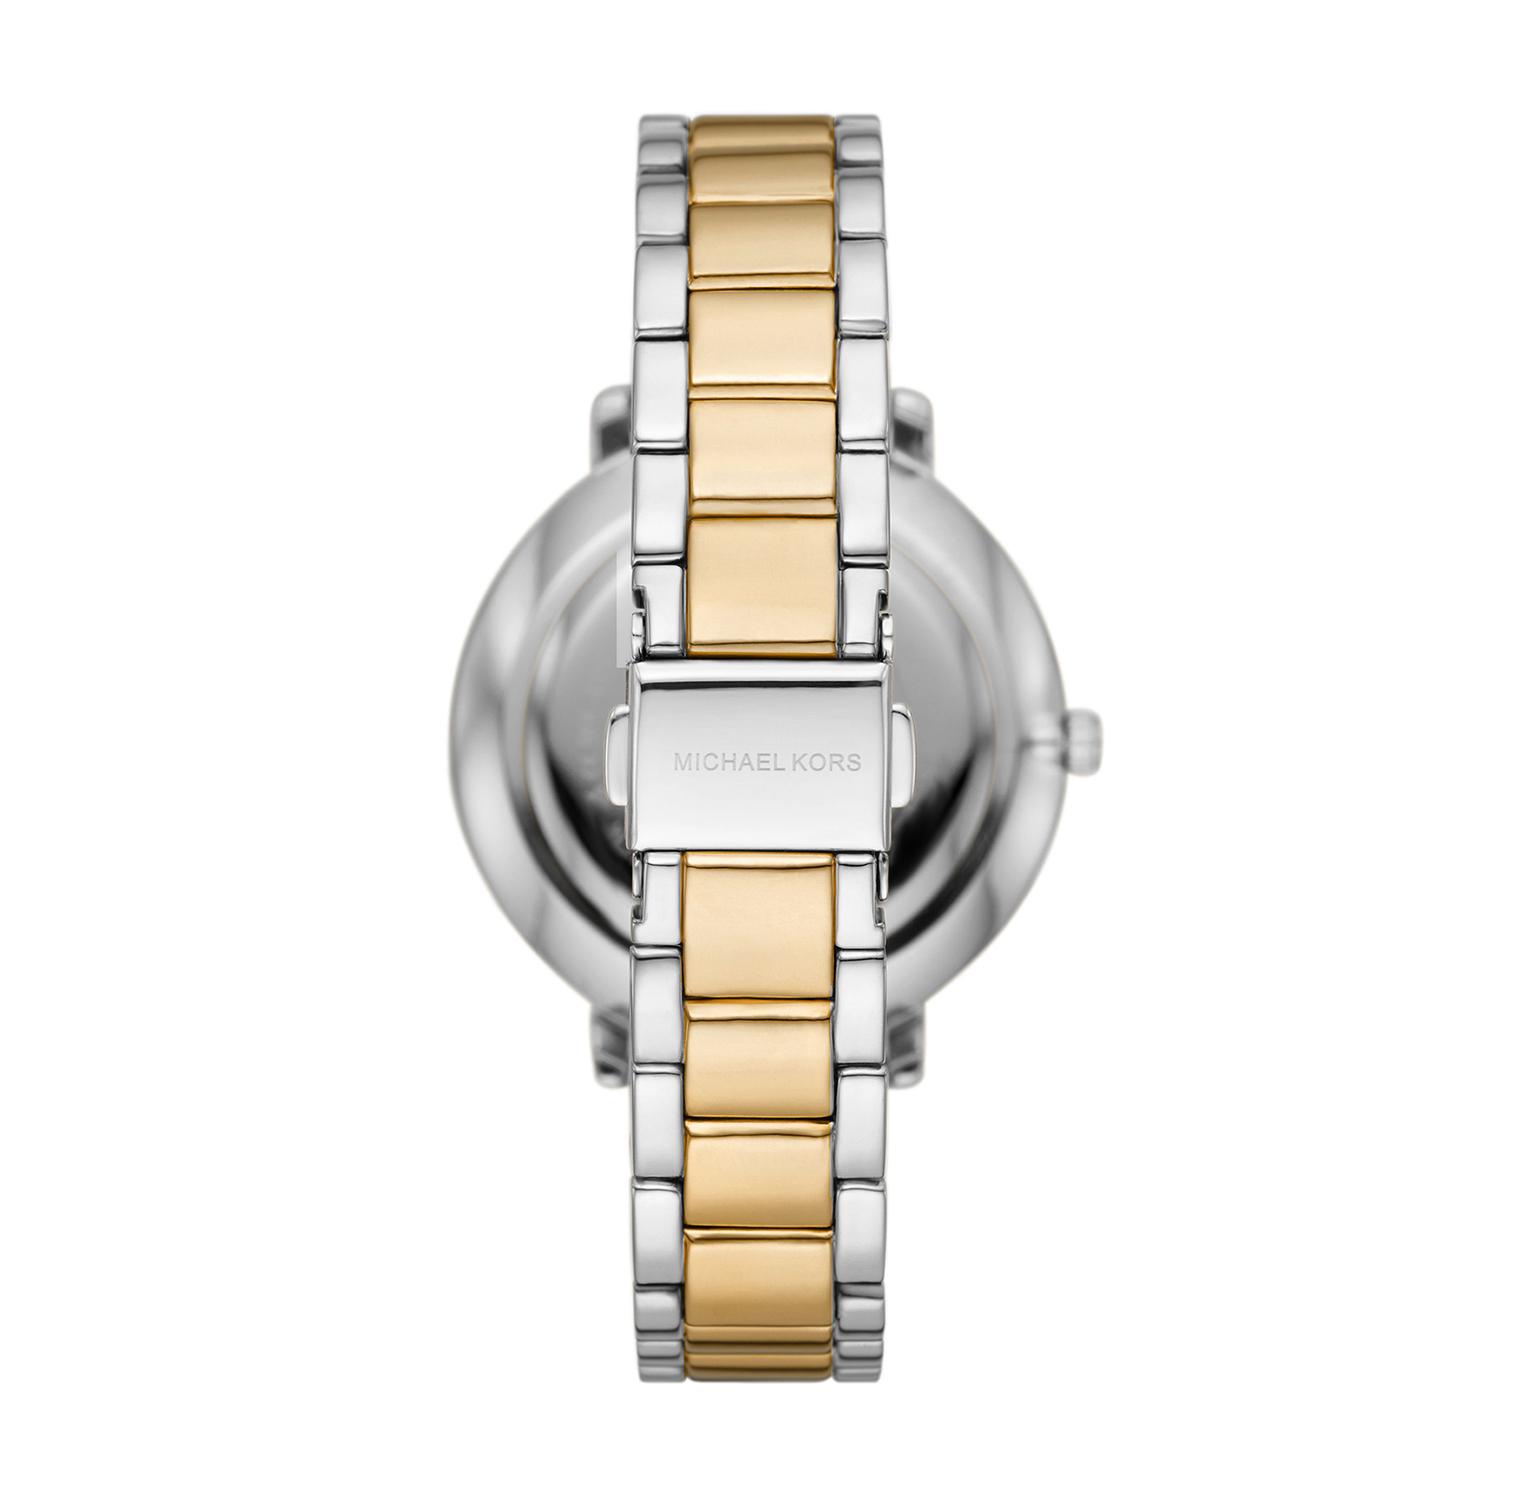 Michael Kors MK4595 zegarek